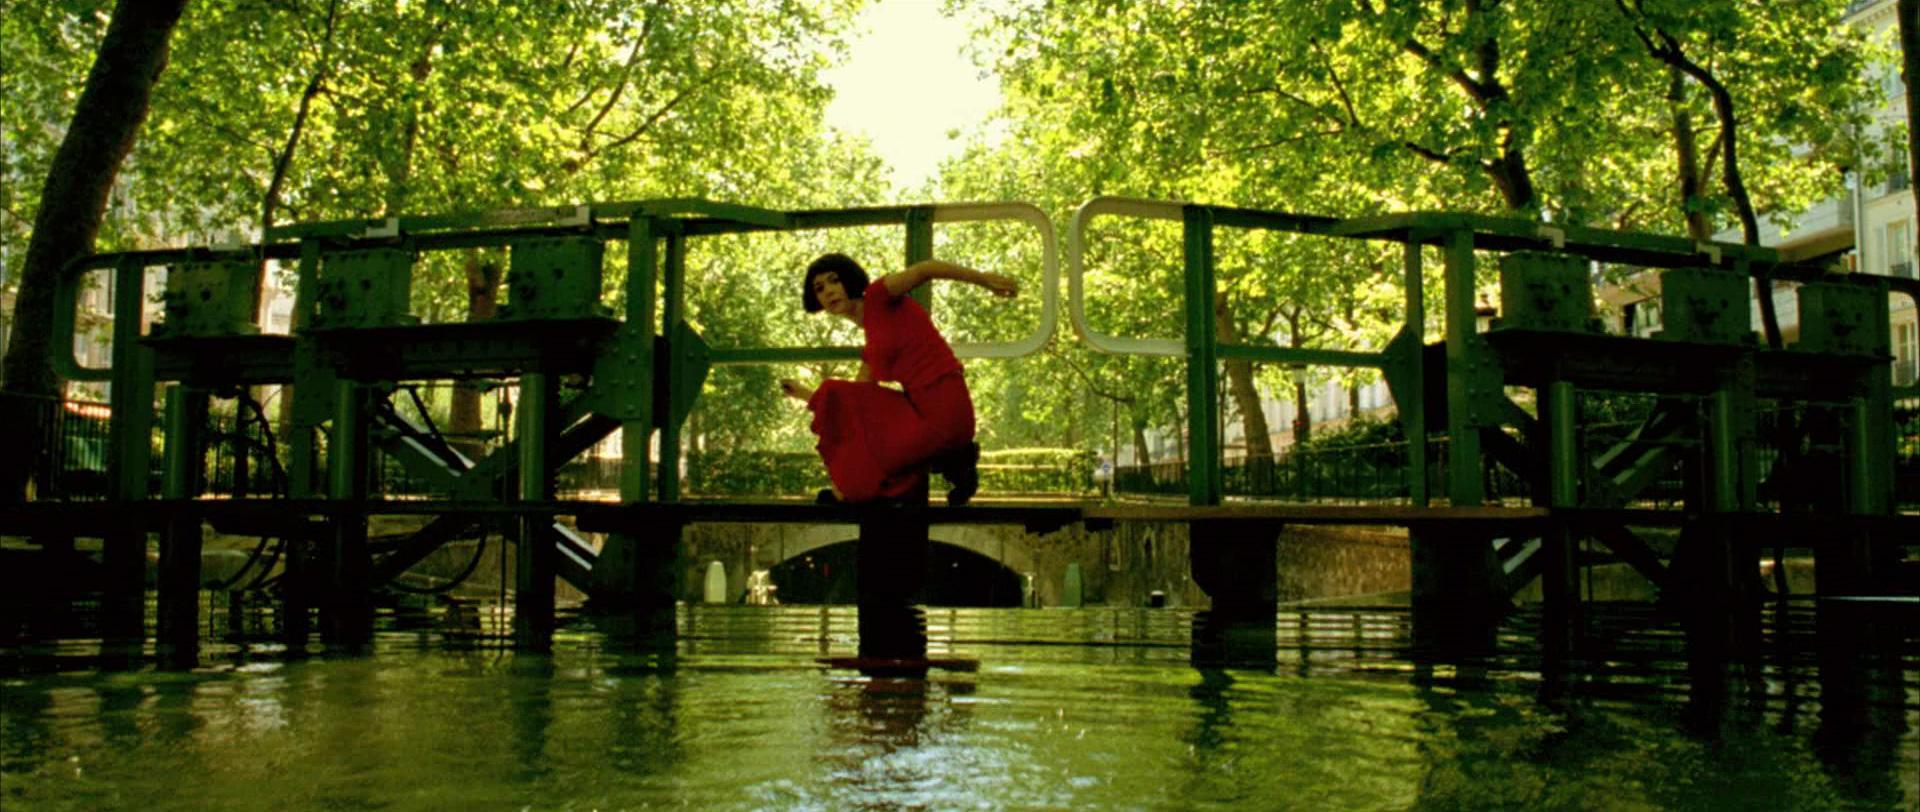 5 film ambientati a parigi - Amelie